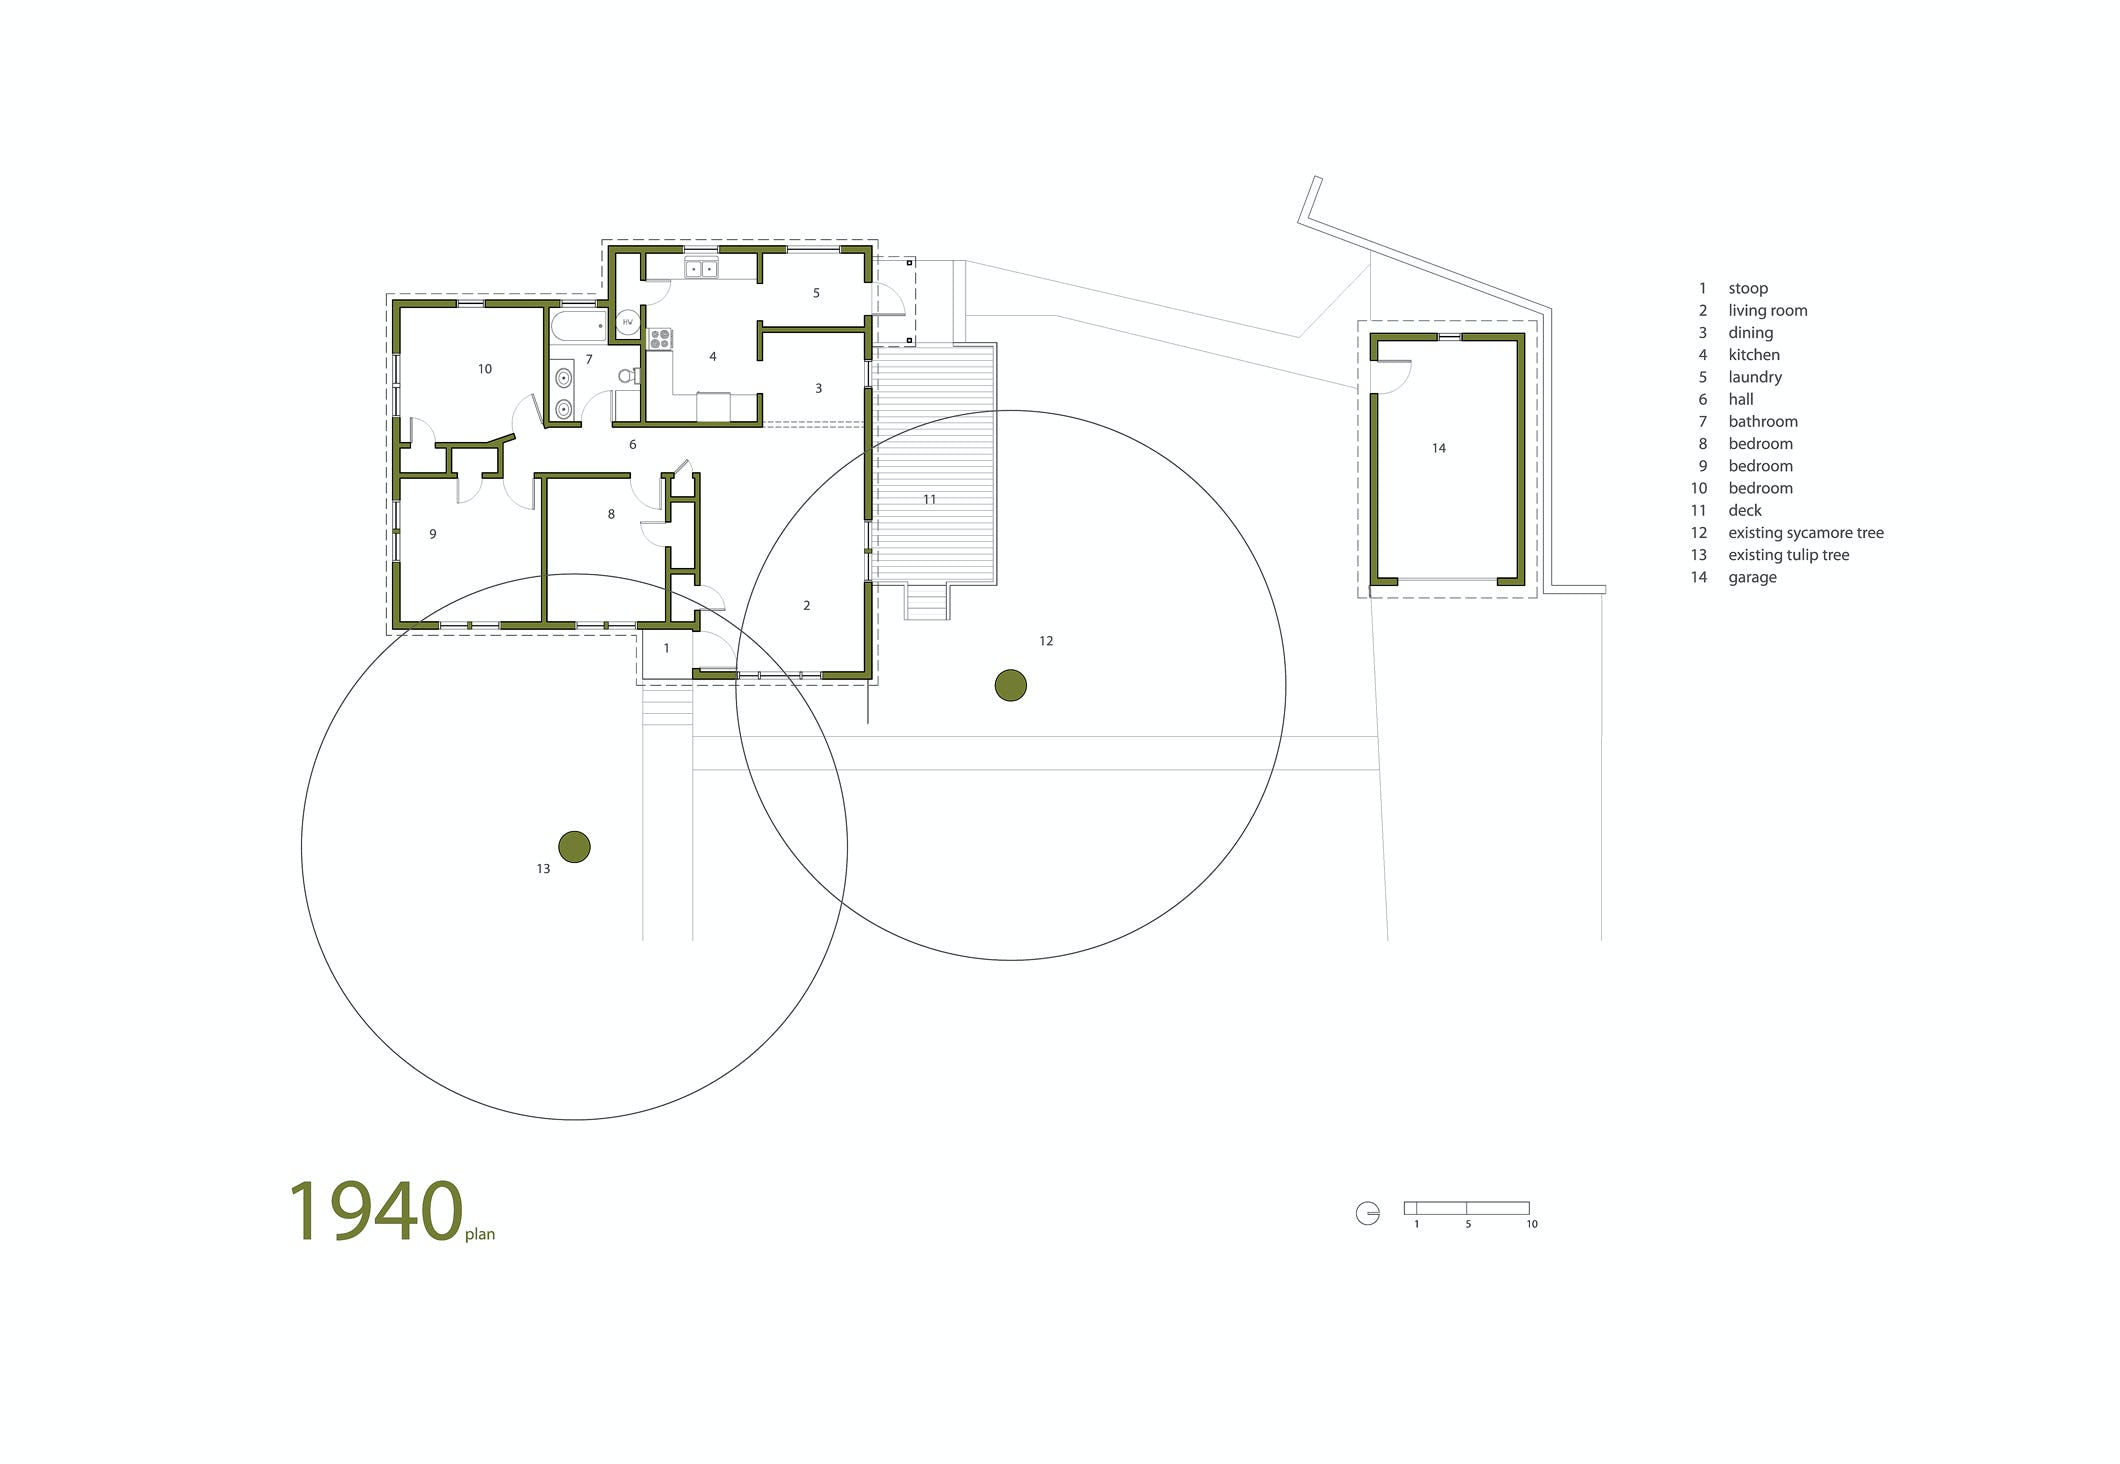 Woolsey 1940 plan